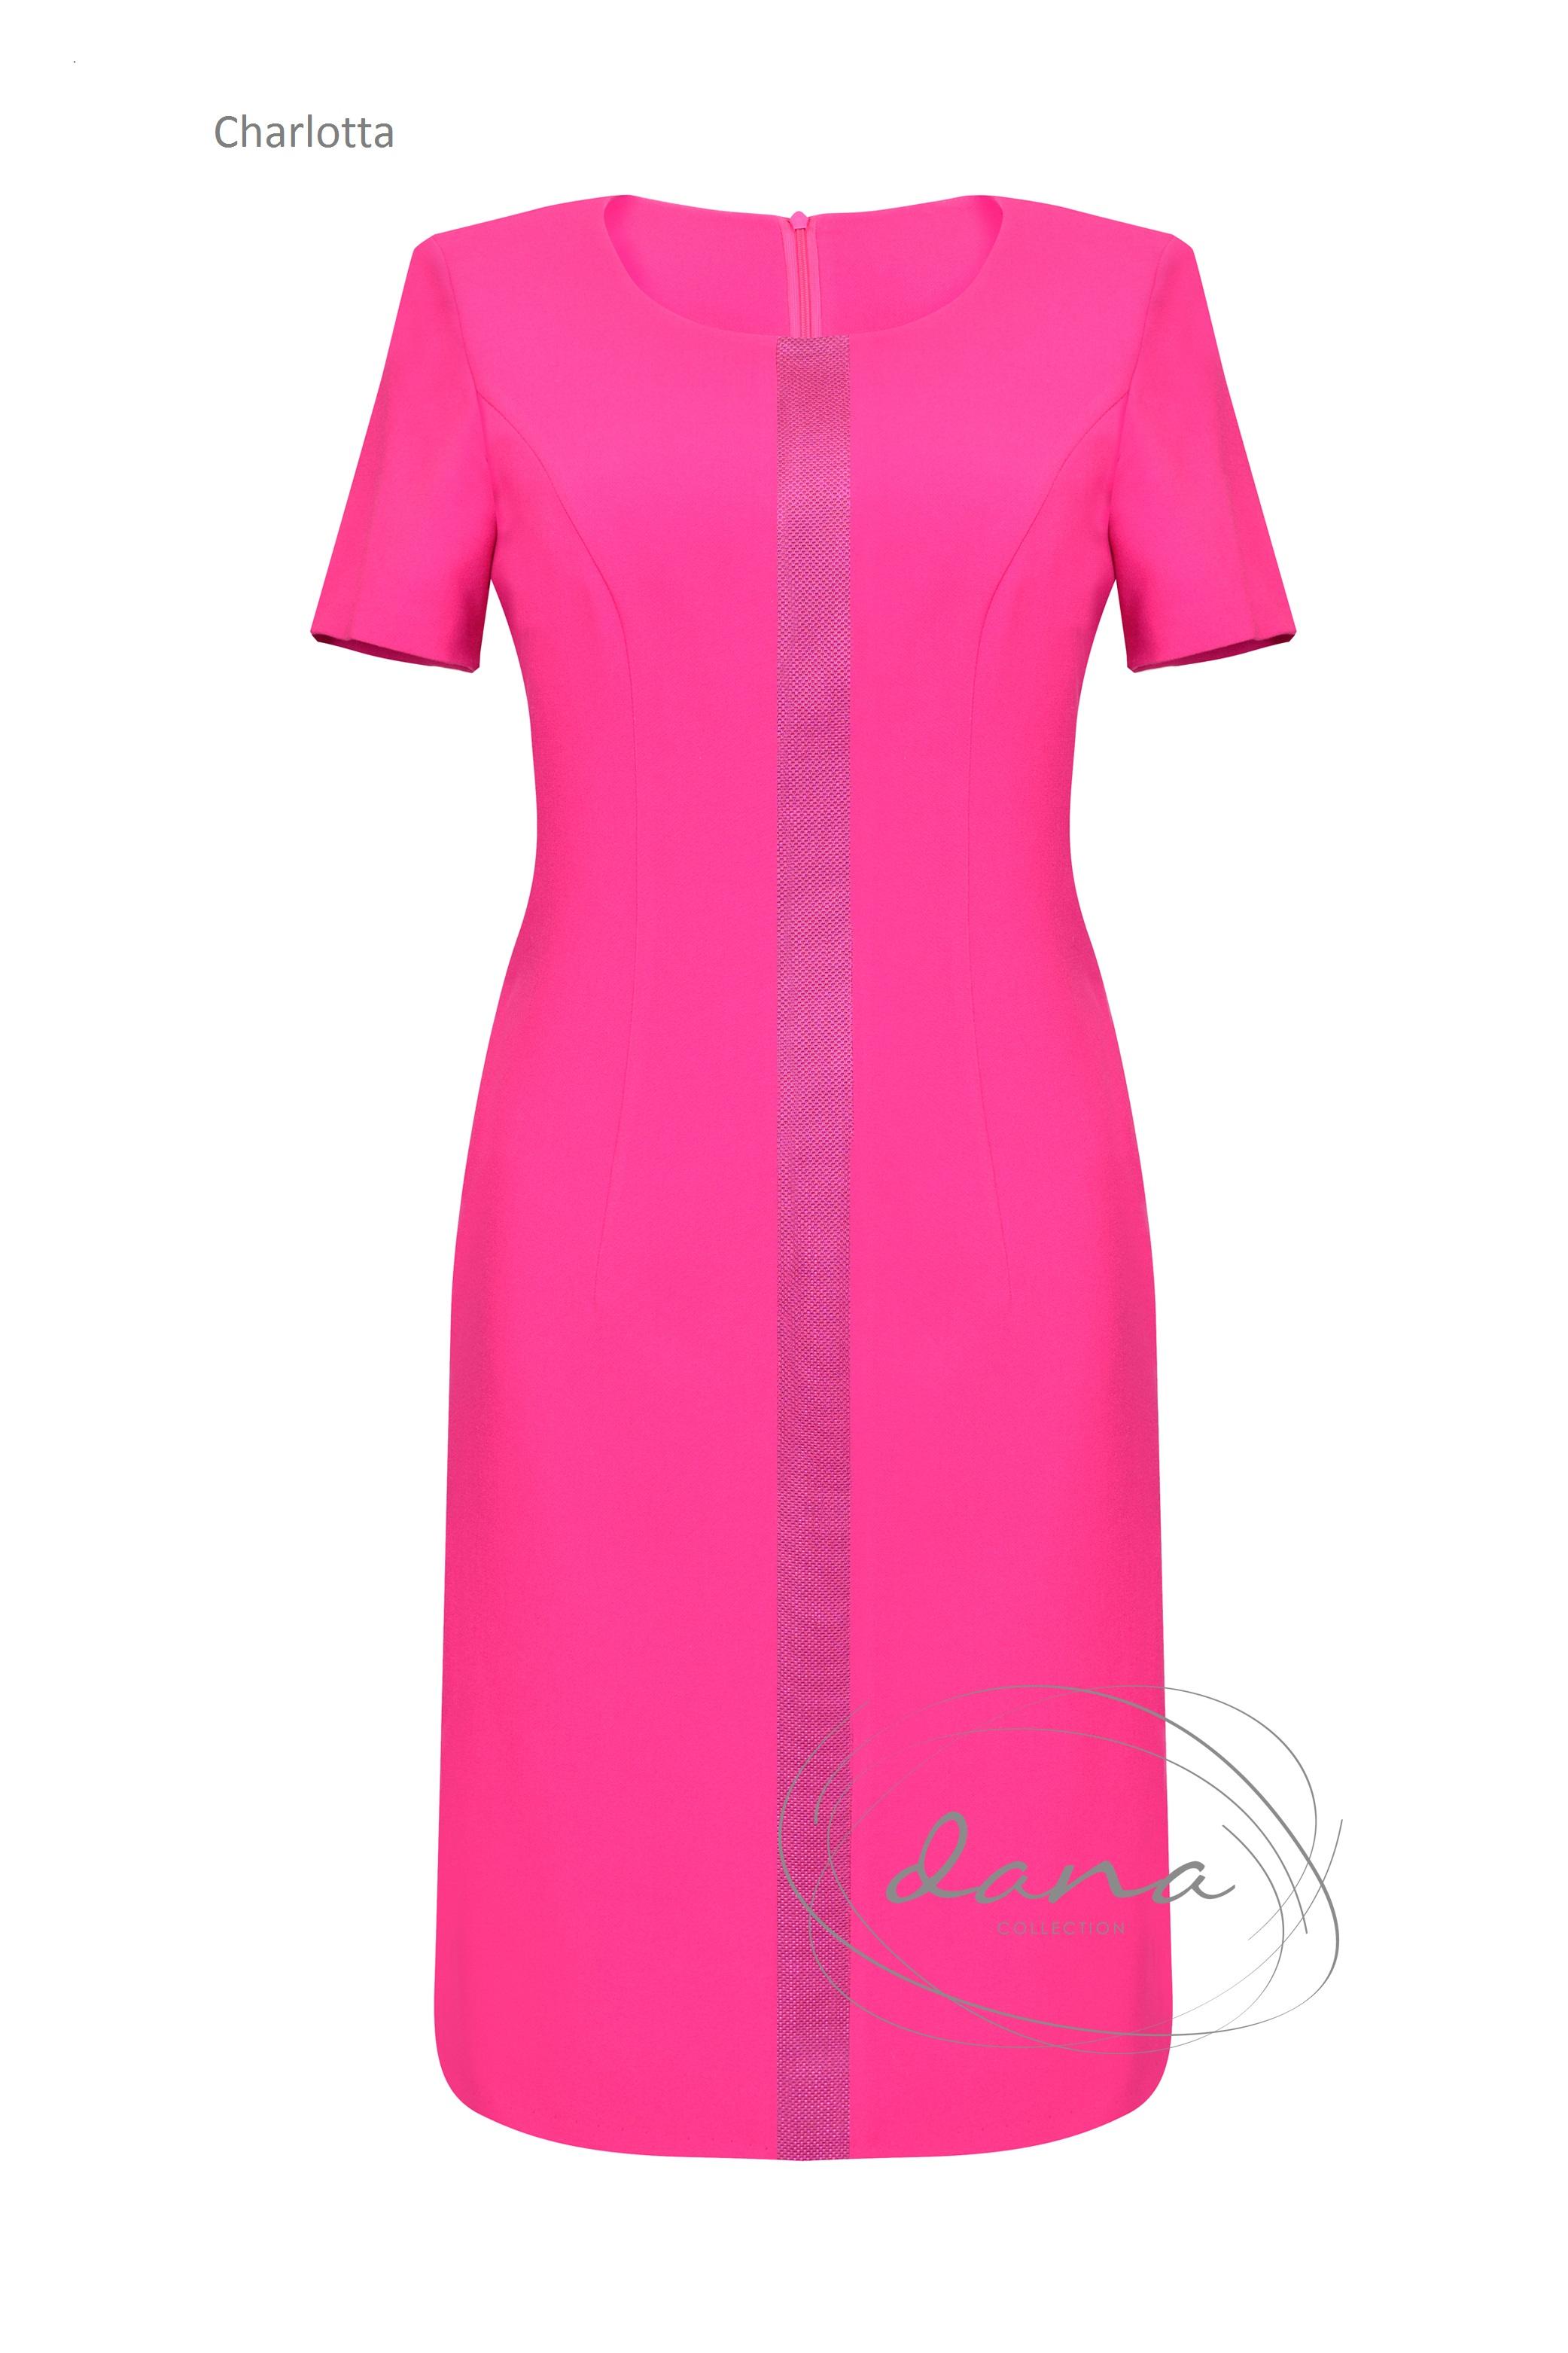 charlotta sukienka